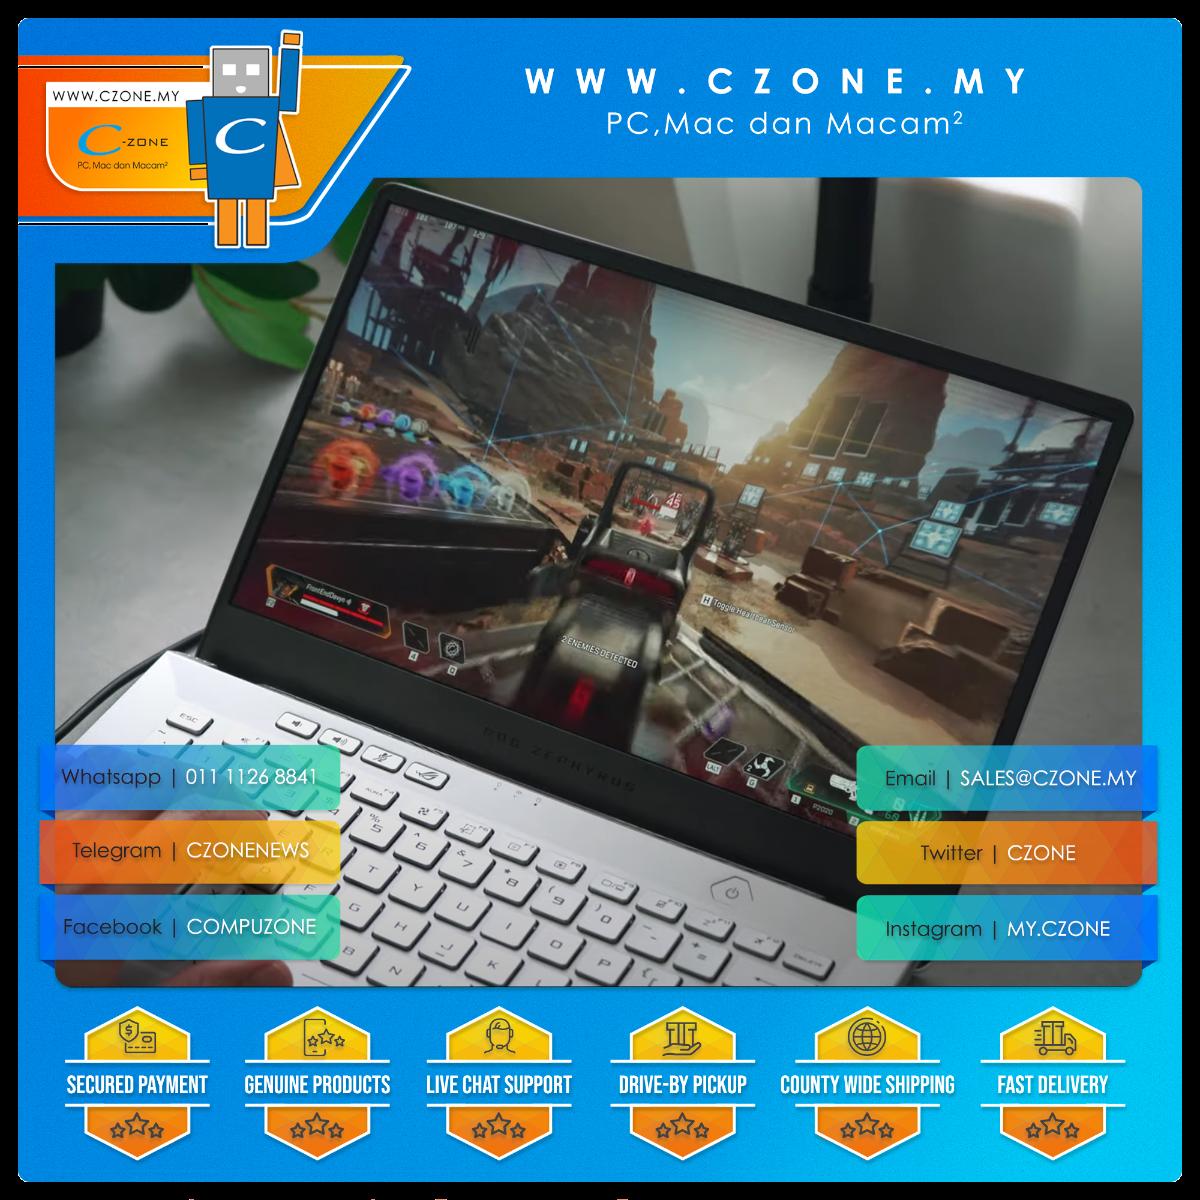 https://czone.my/czone/computer-components/monitors/professional-monitors.html